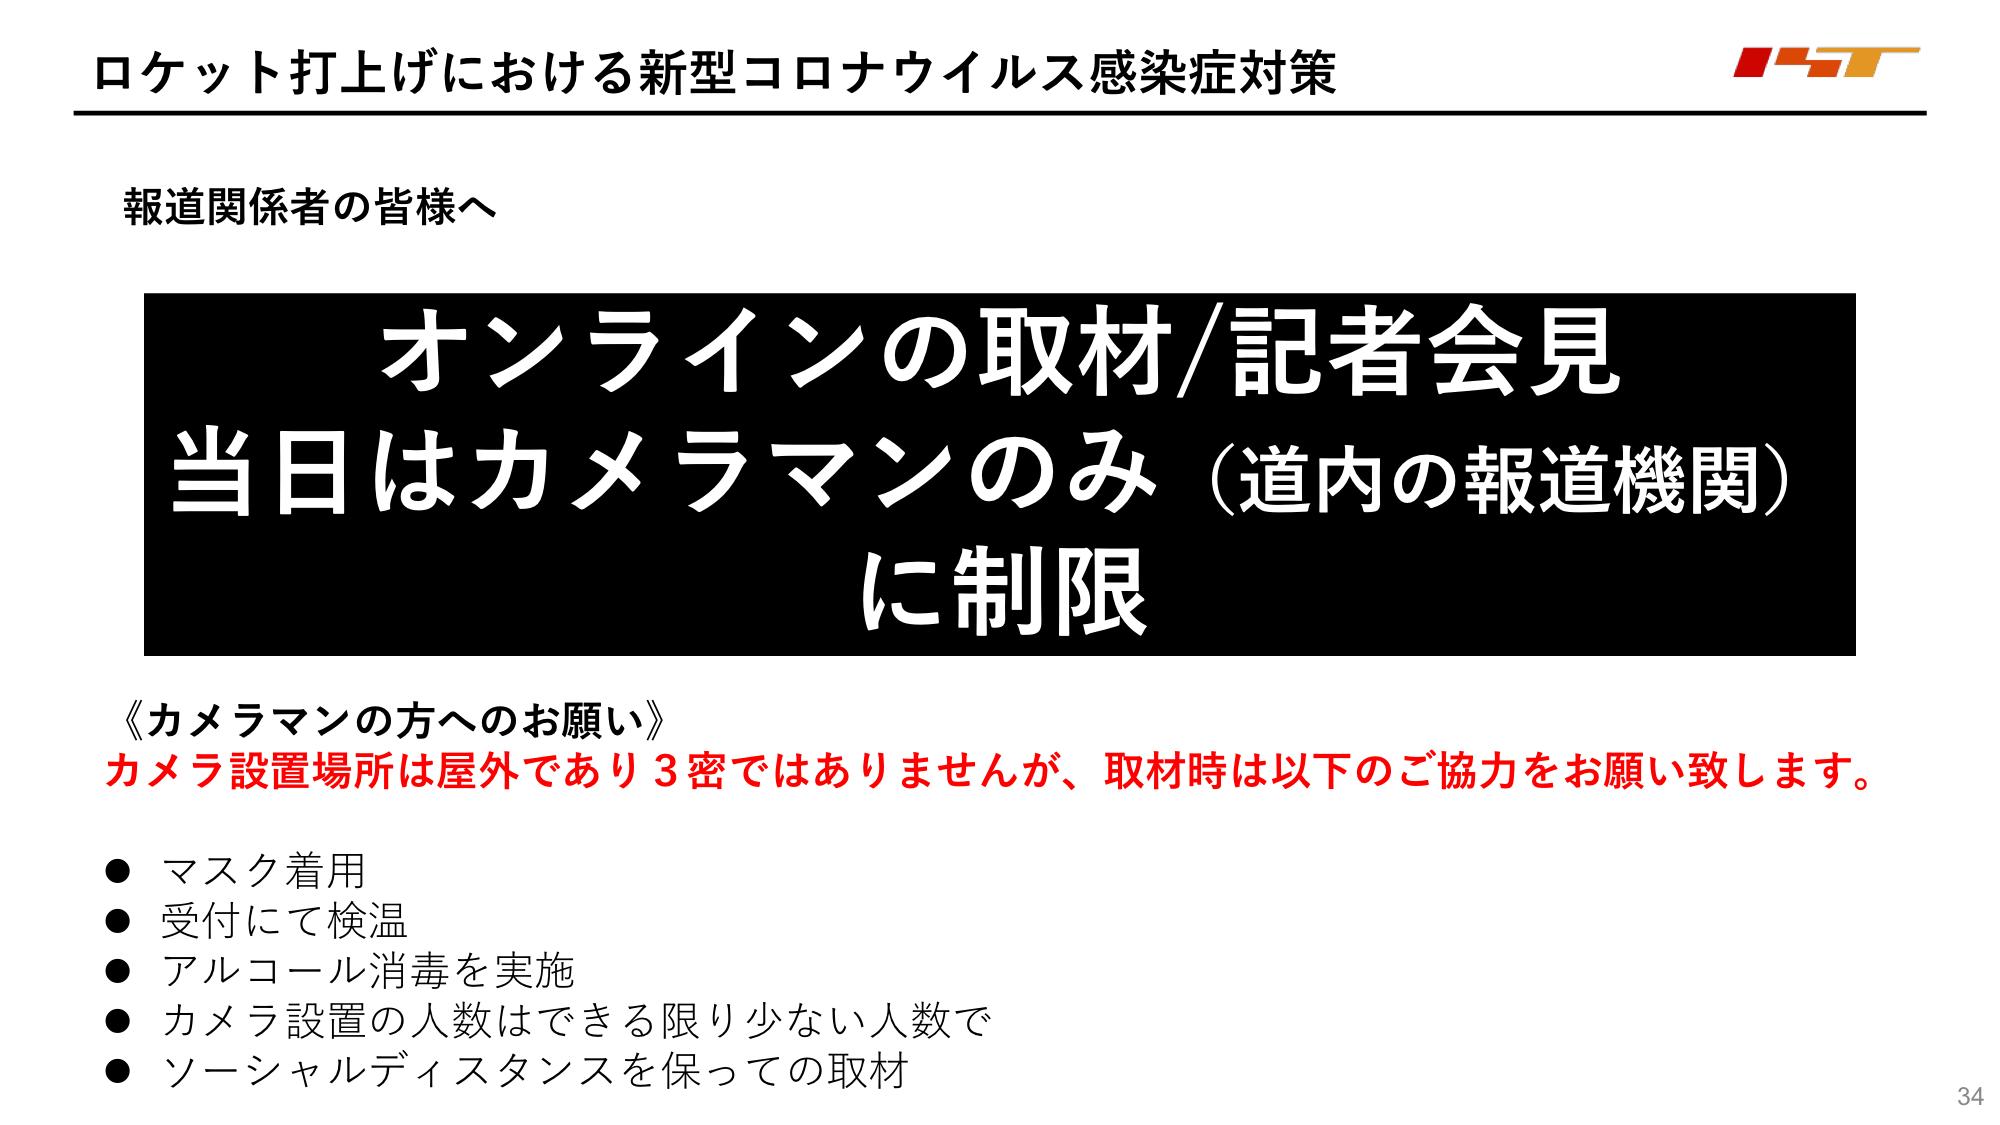 f:id:Imamura:20200603233044p:plain